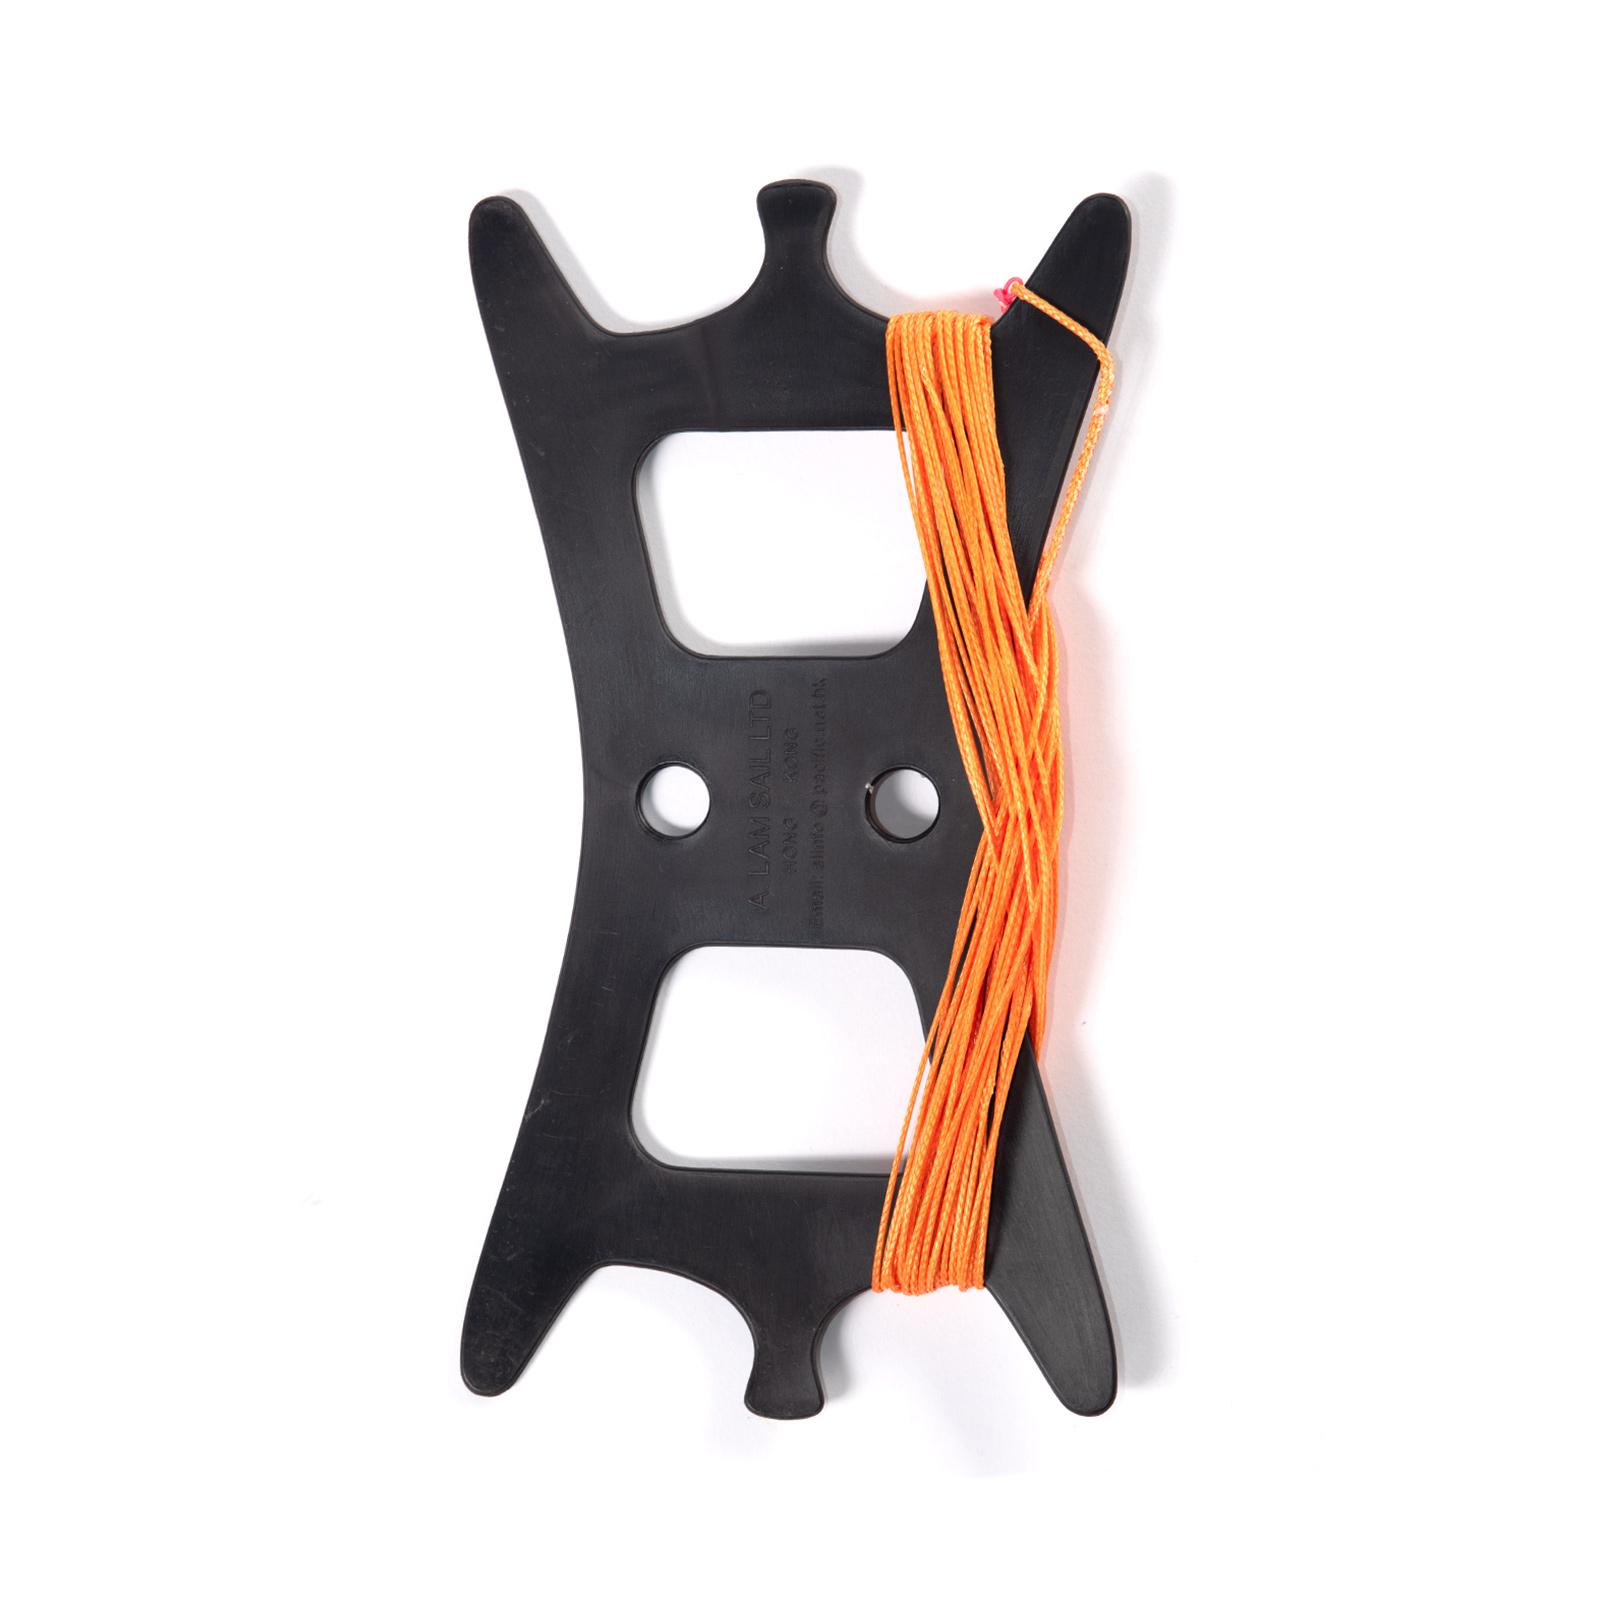 Šnúry Flysurfer pro Connect bar - back orange 7m